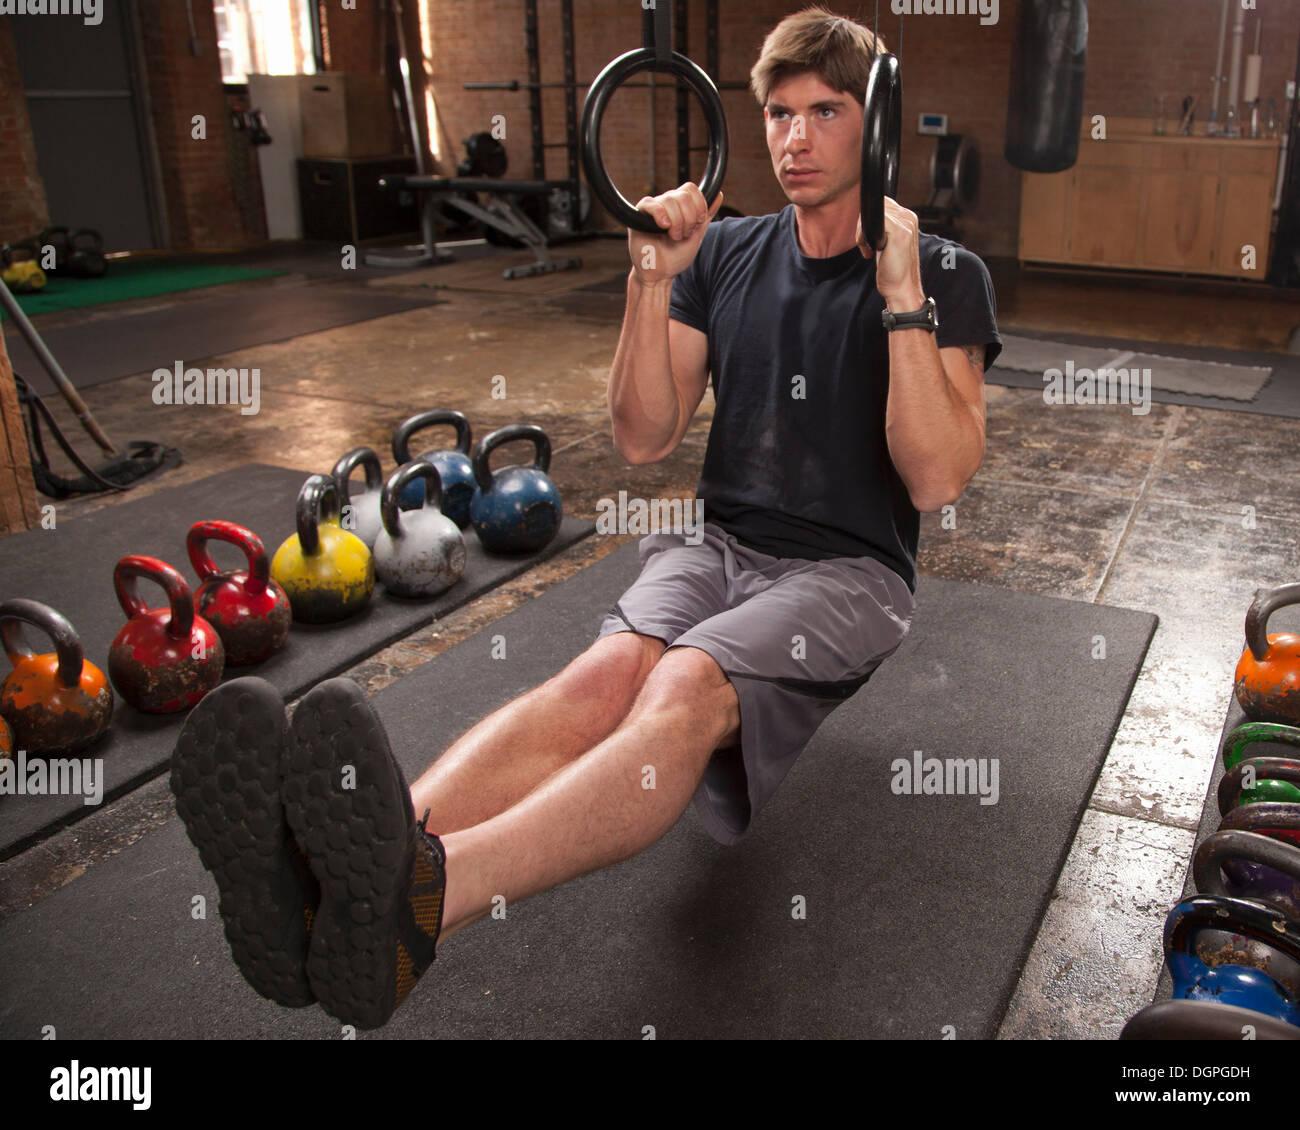 Bodybuilder on gym floor using rings - Stock Image